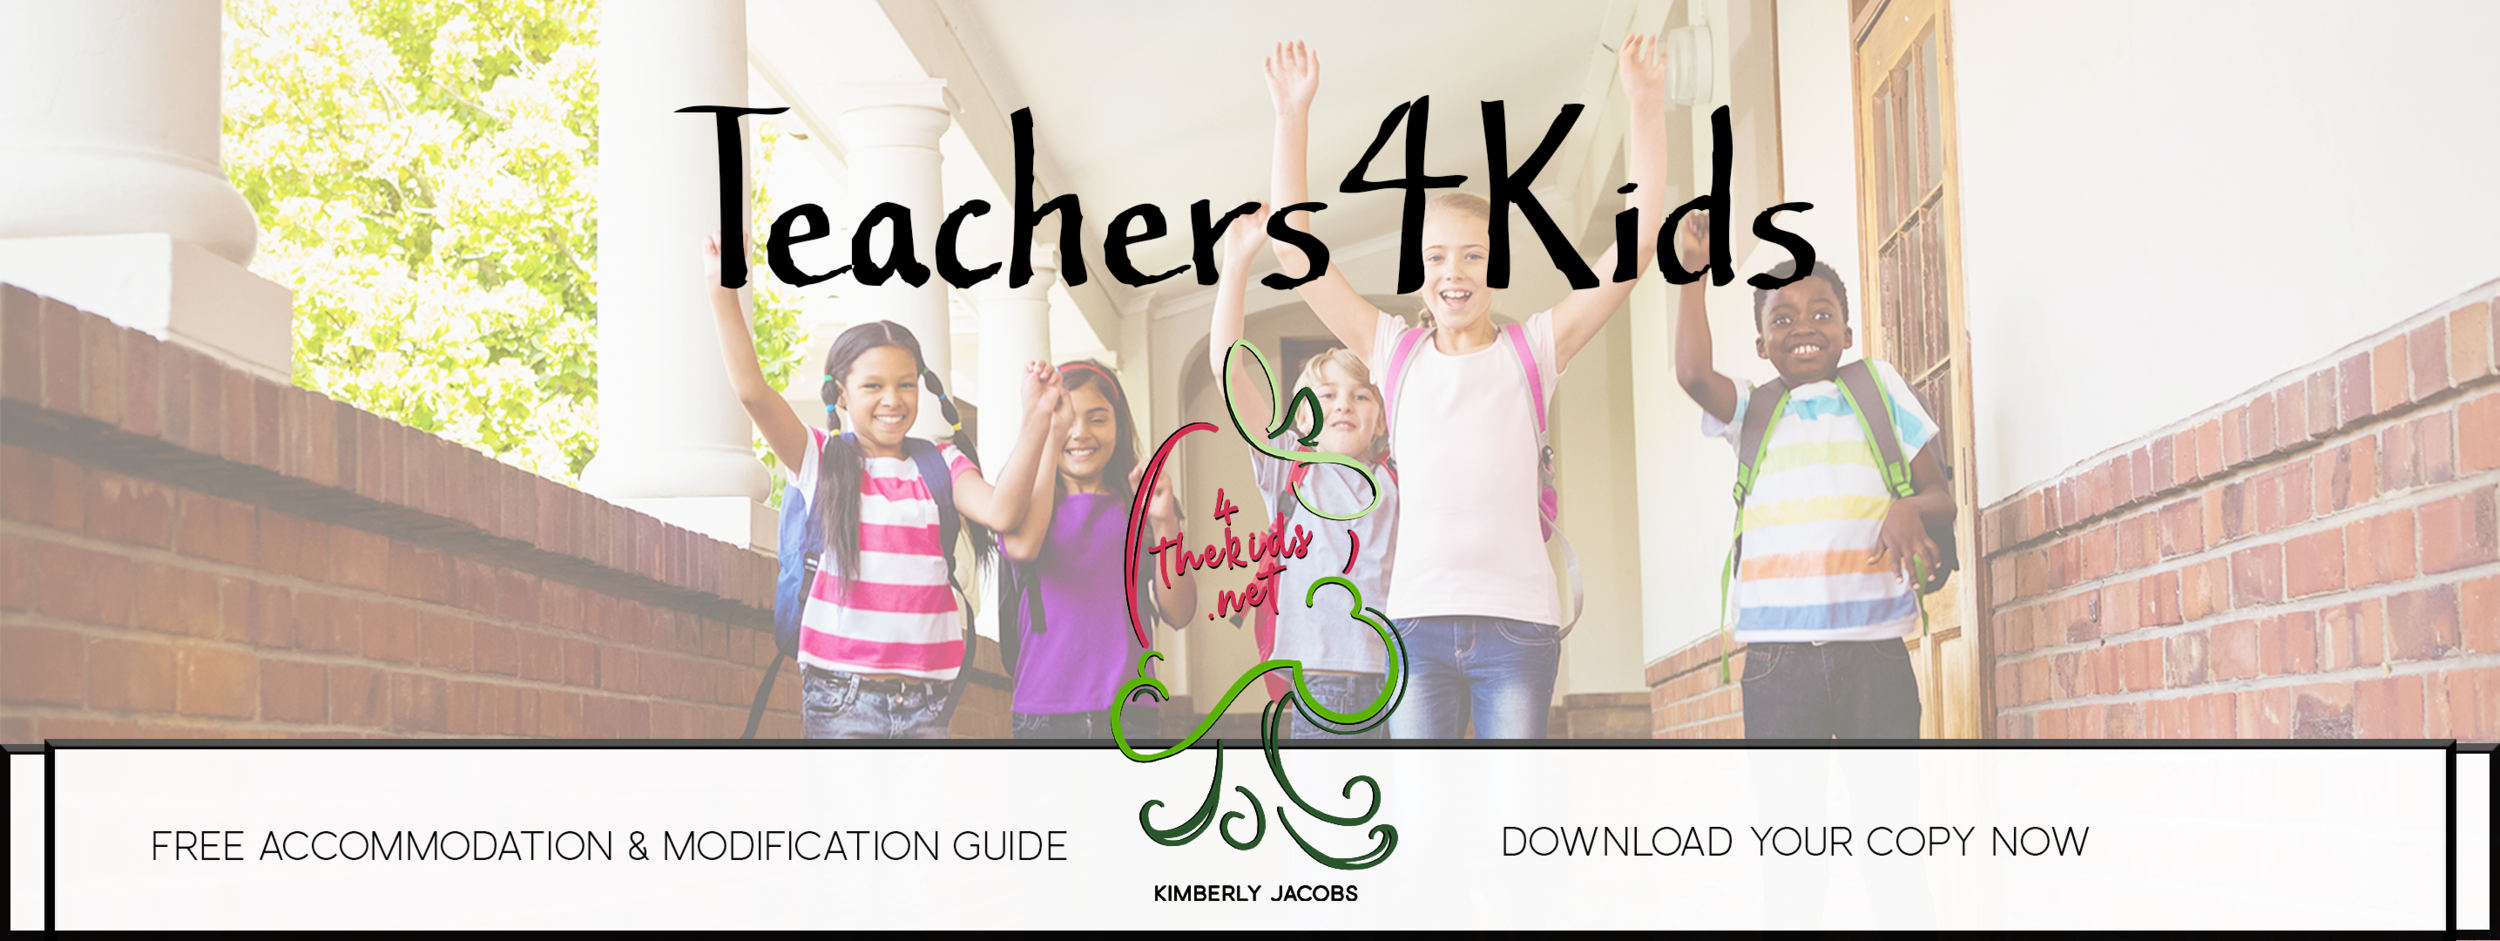 [4TK]Teachers4Kids-Cover.png